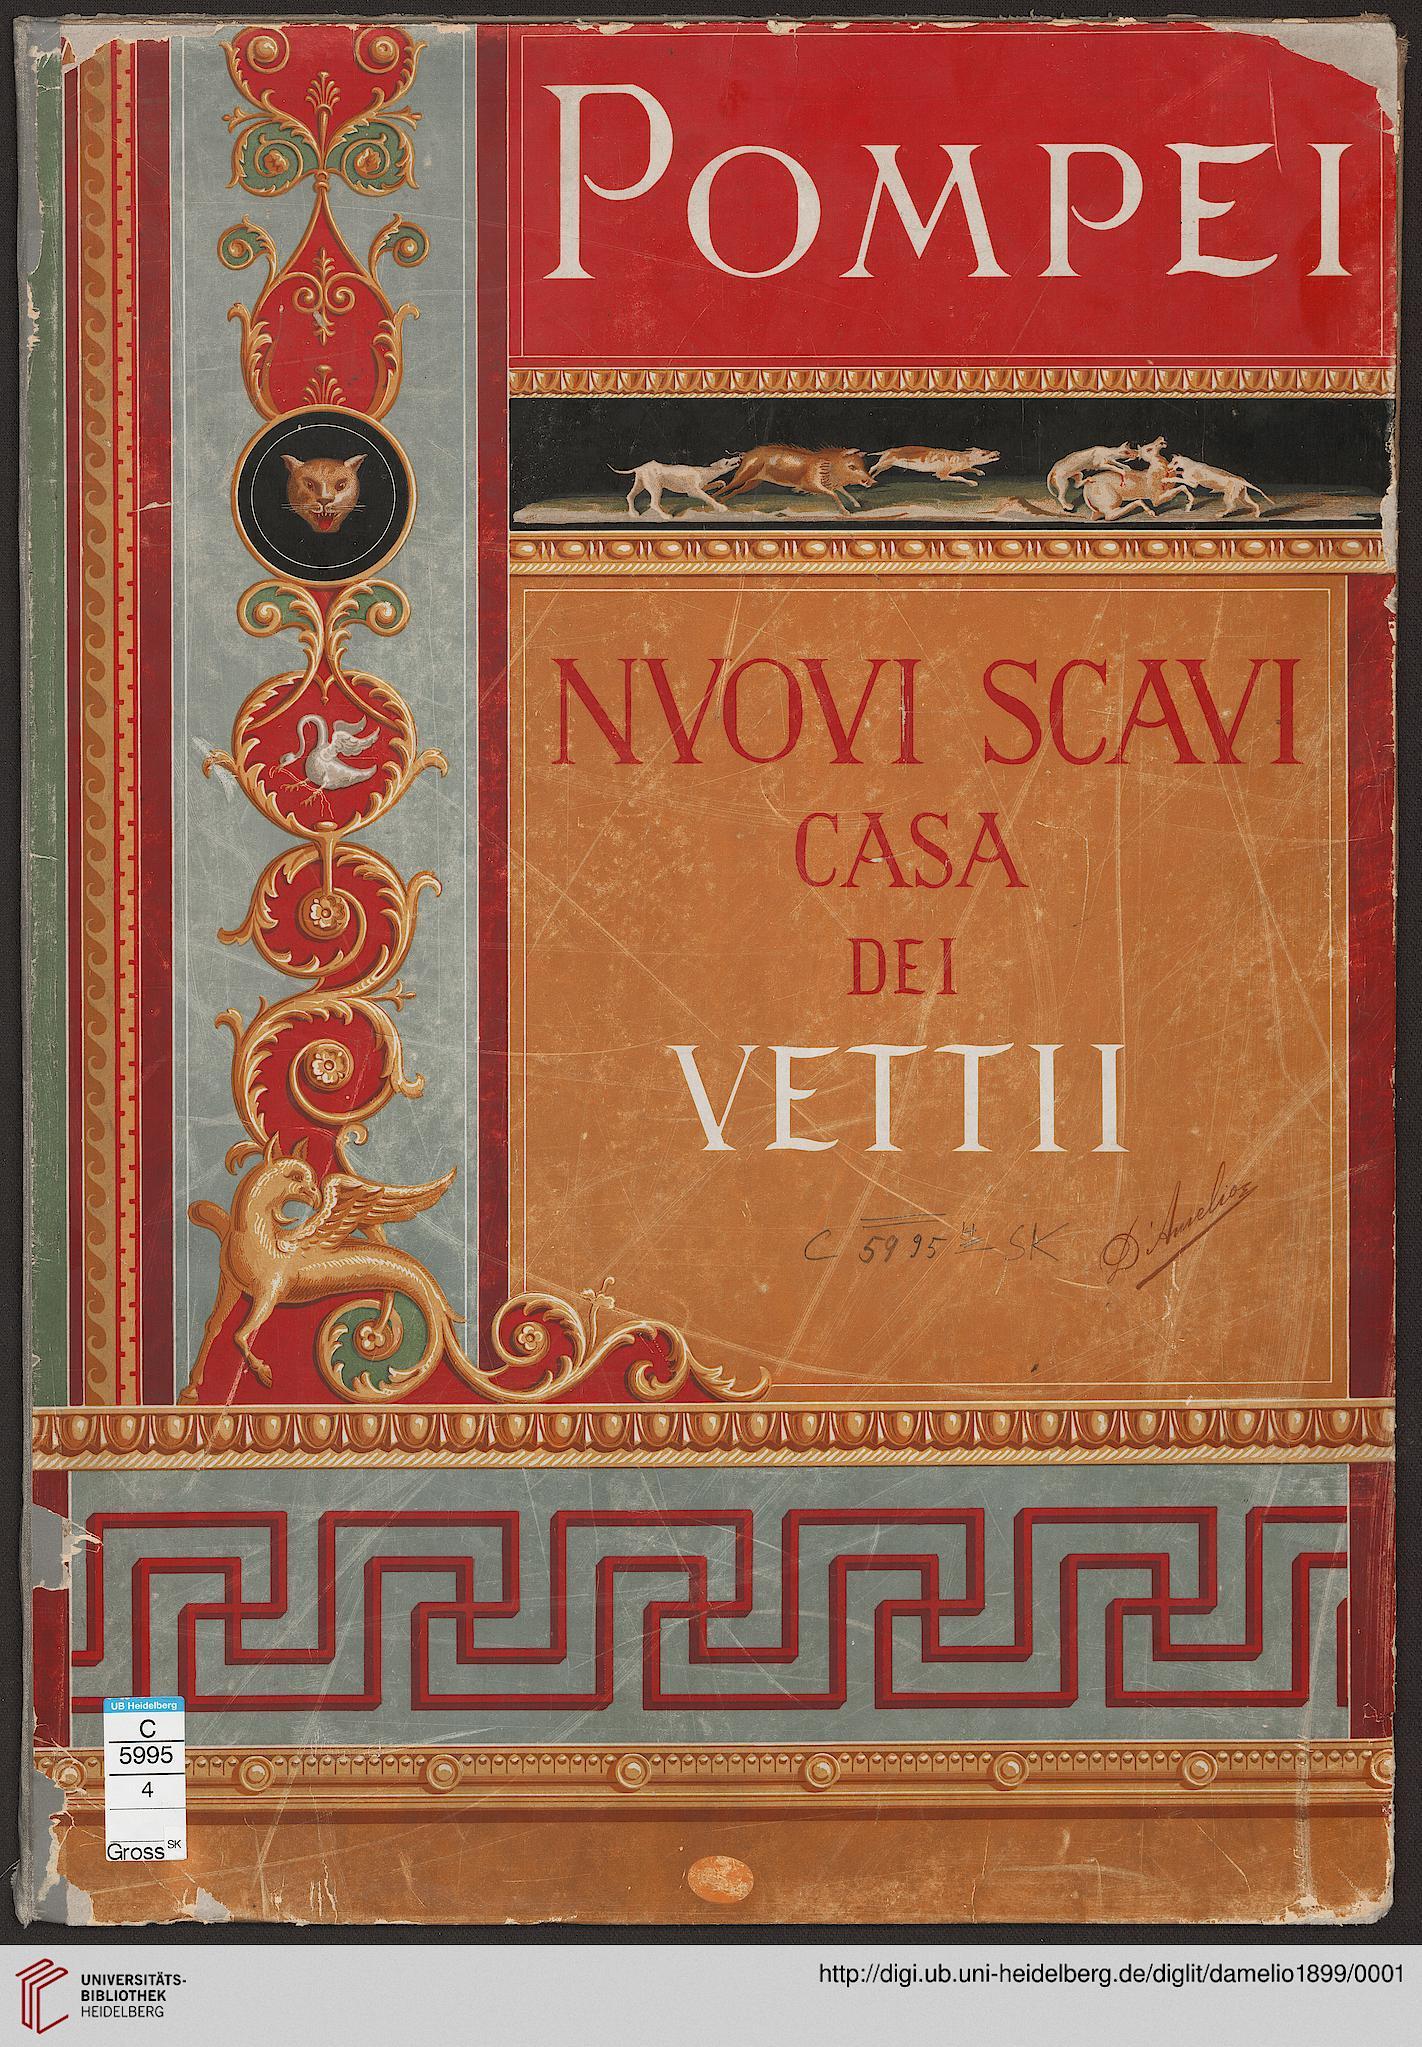 ... Pompei: casa dei Vettii ; appendice al dipinti murali (Neapel, 1899